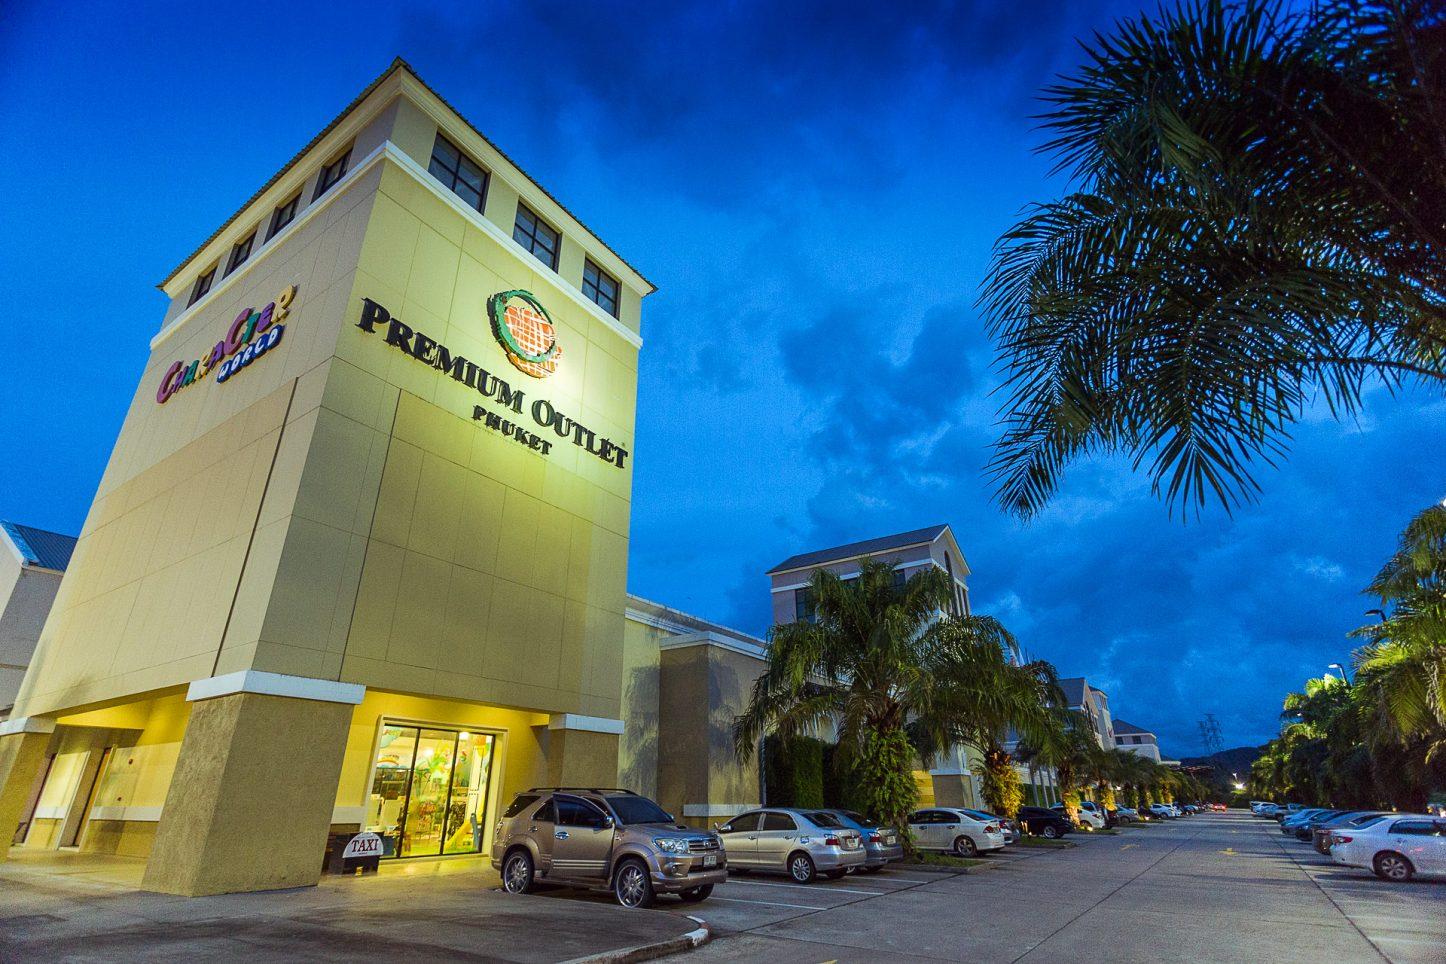 Phuket Premium outlet | Kata Rocks Resort Phuket Thailand